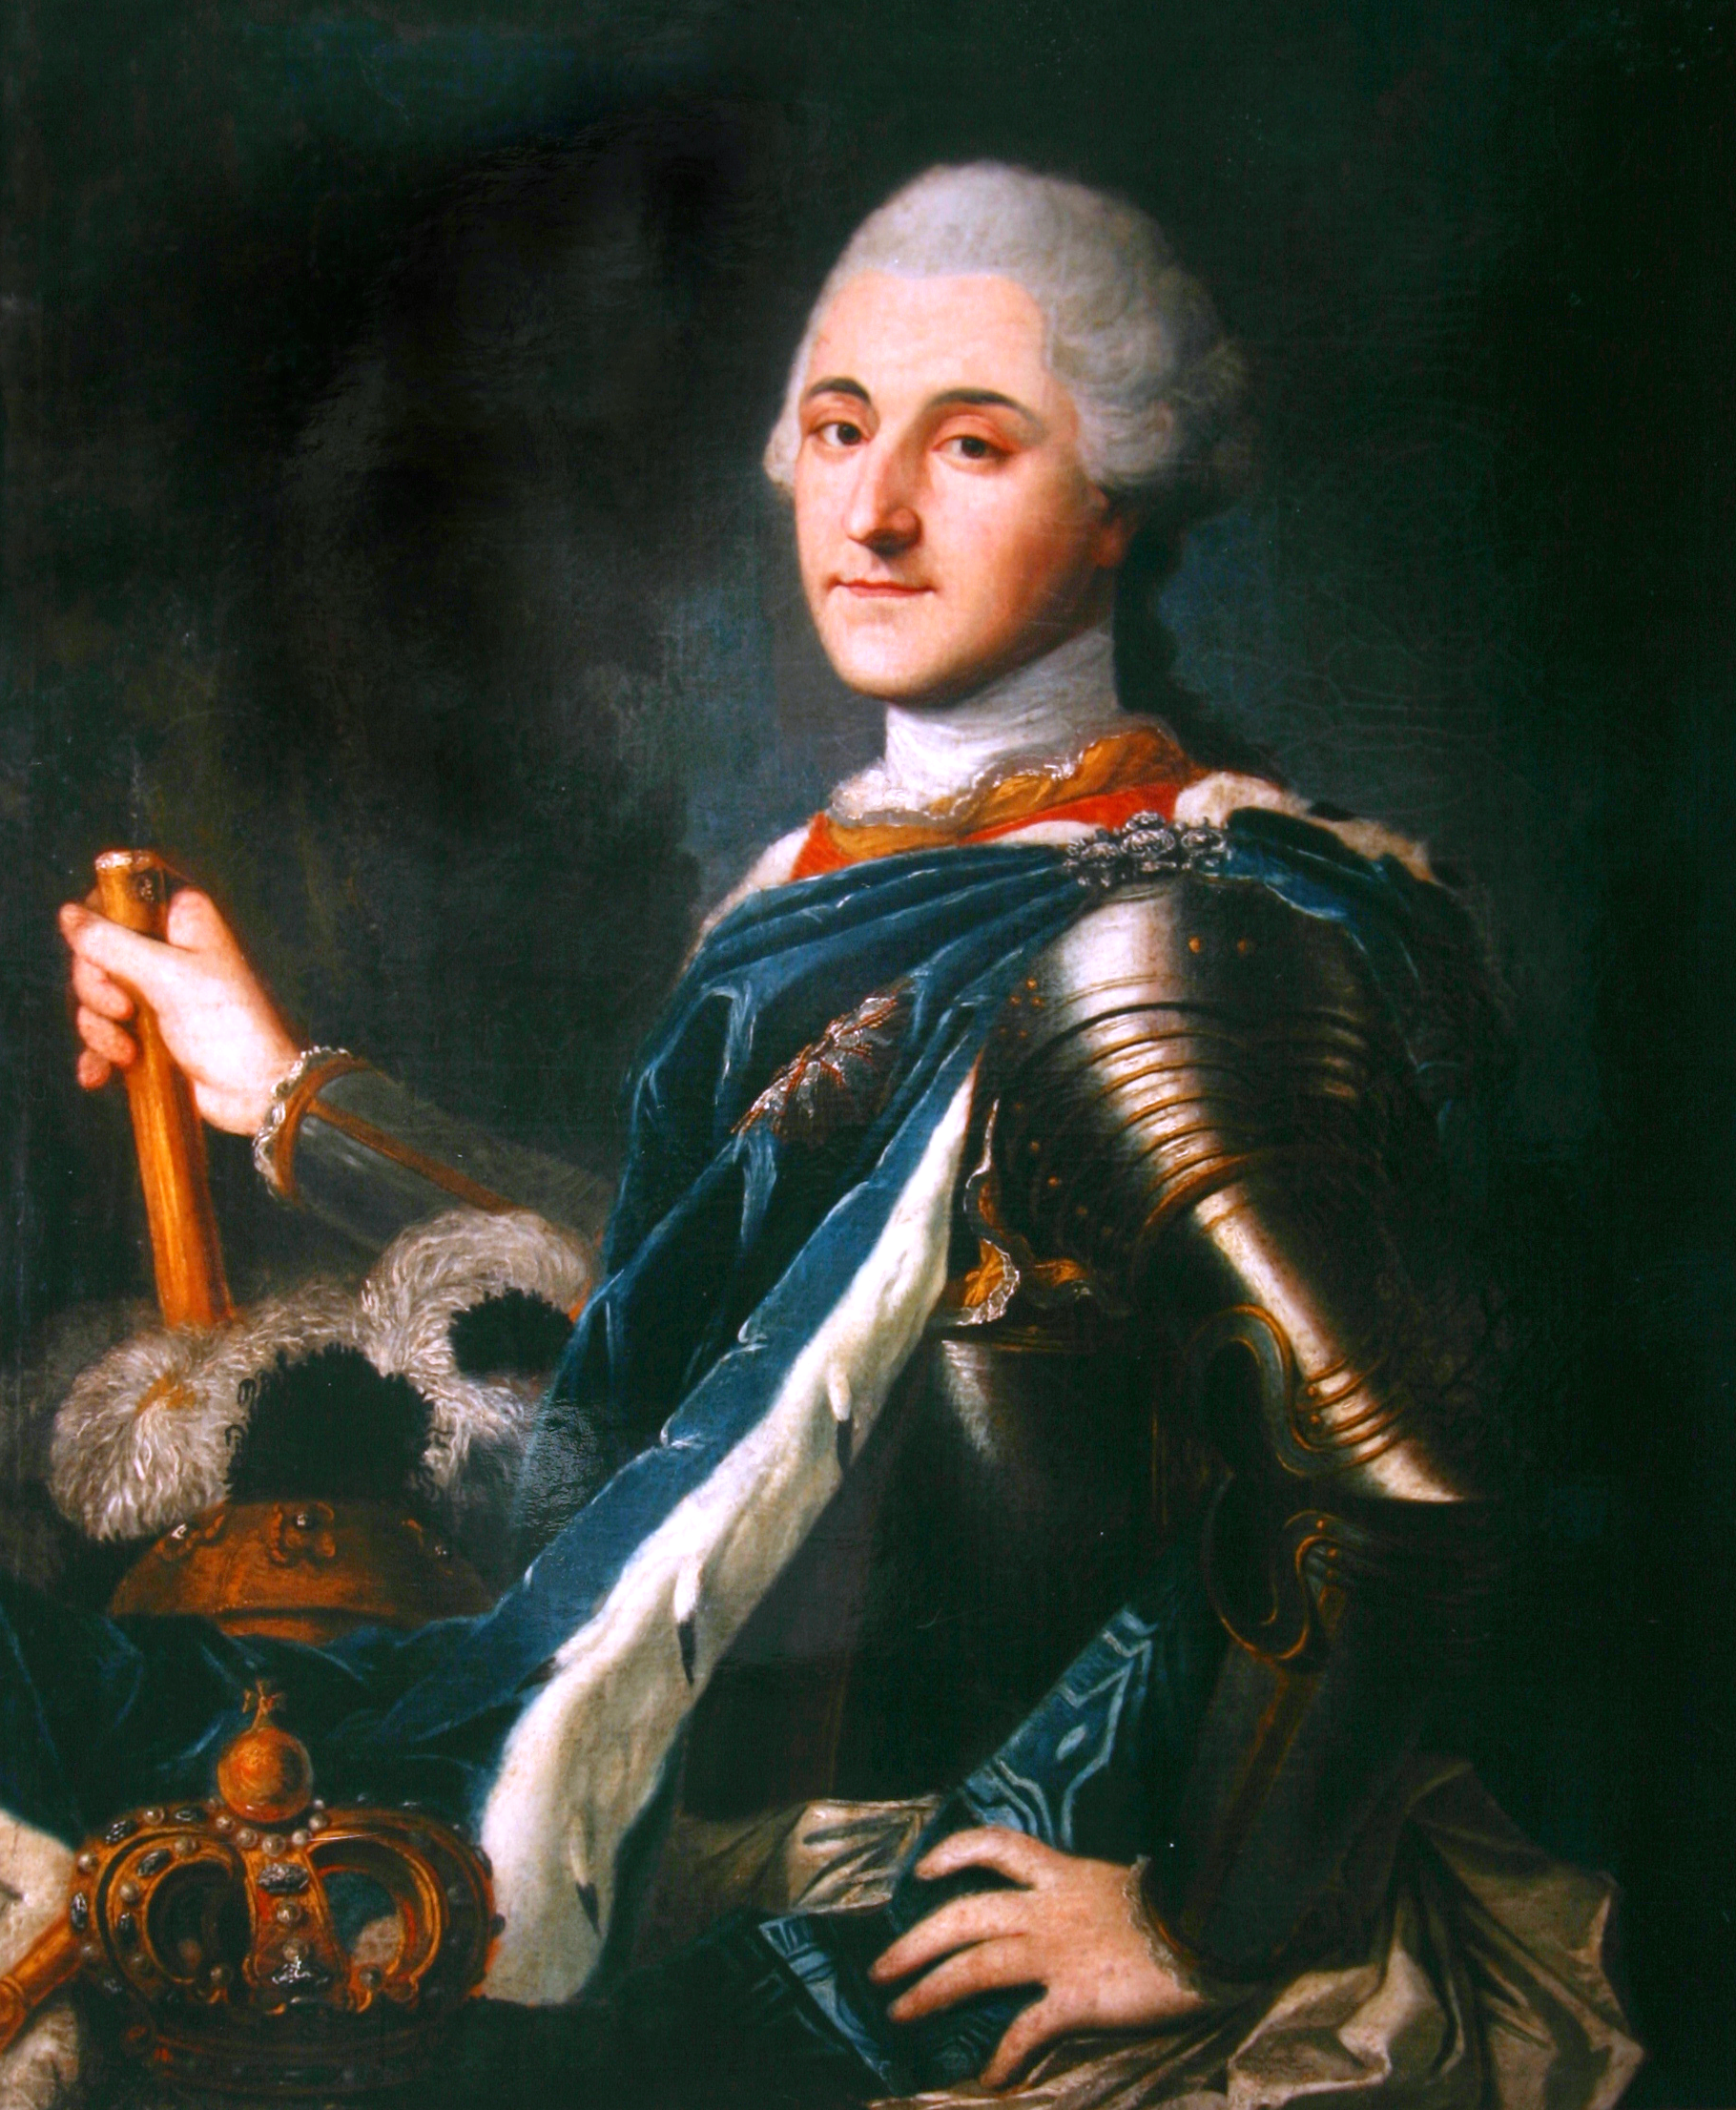 Stanislaw August Poniatowski - Alchetron, the free social encyclopedia